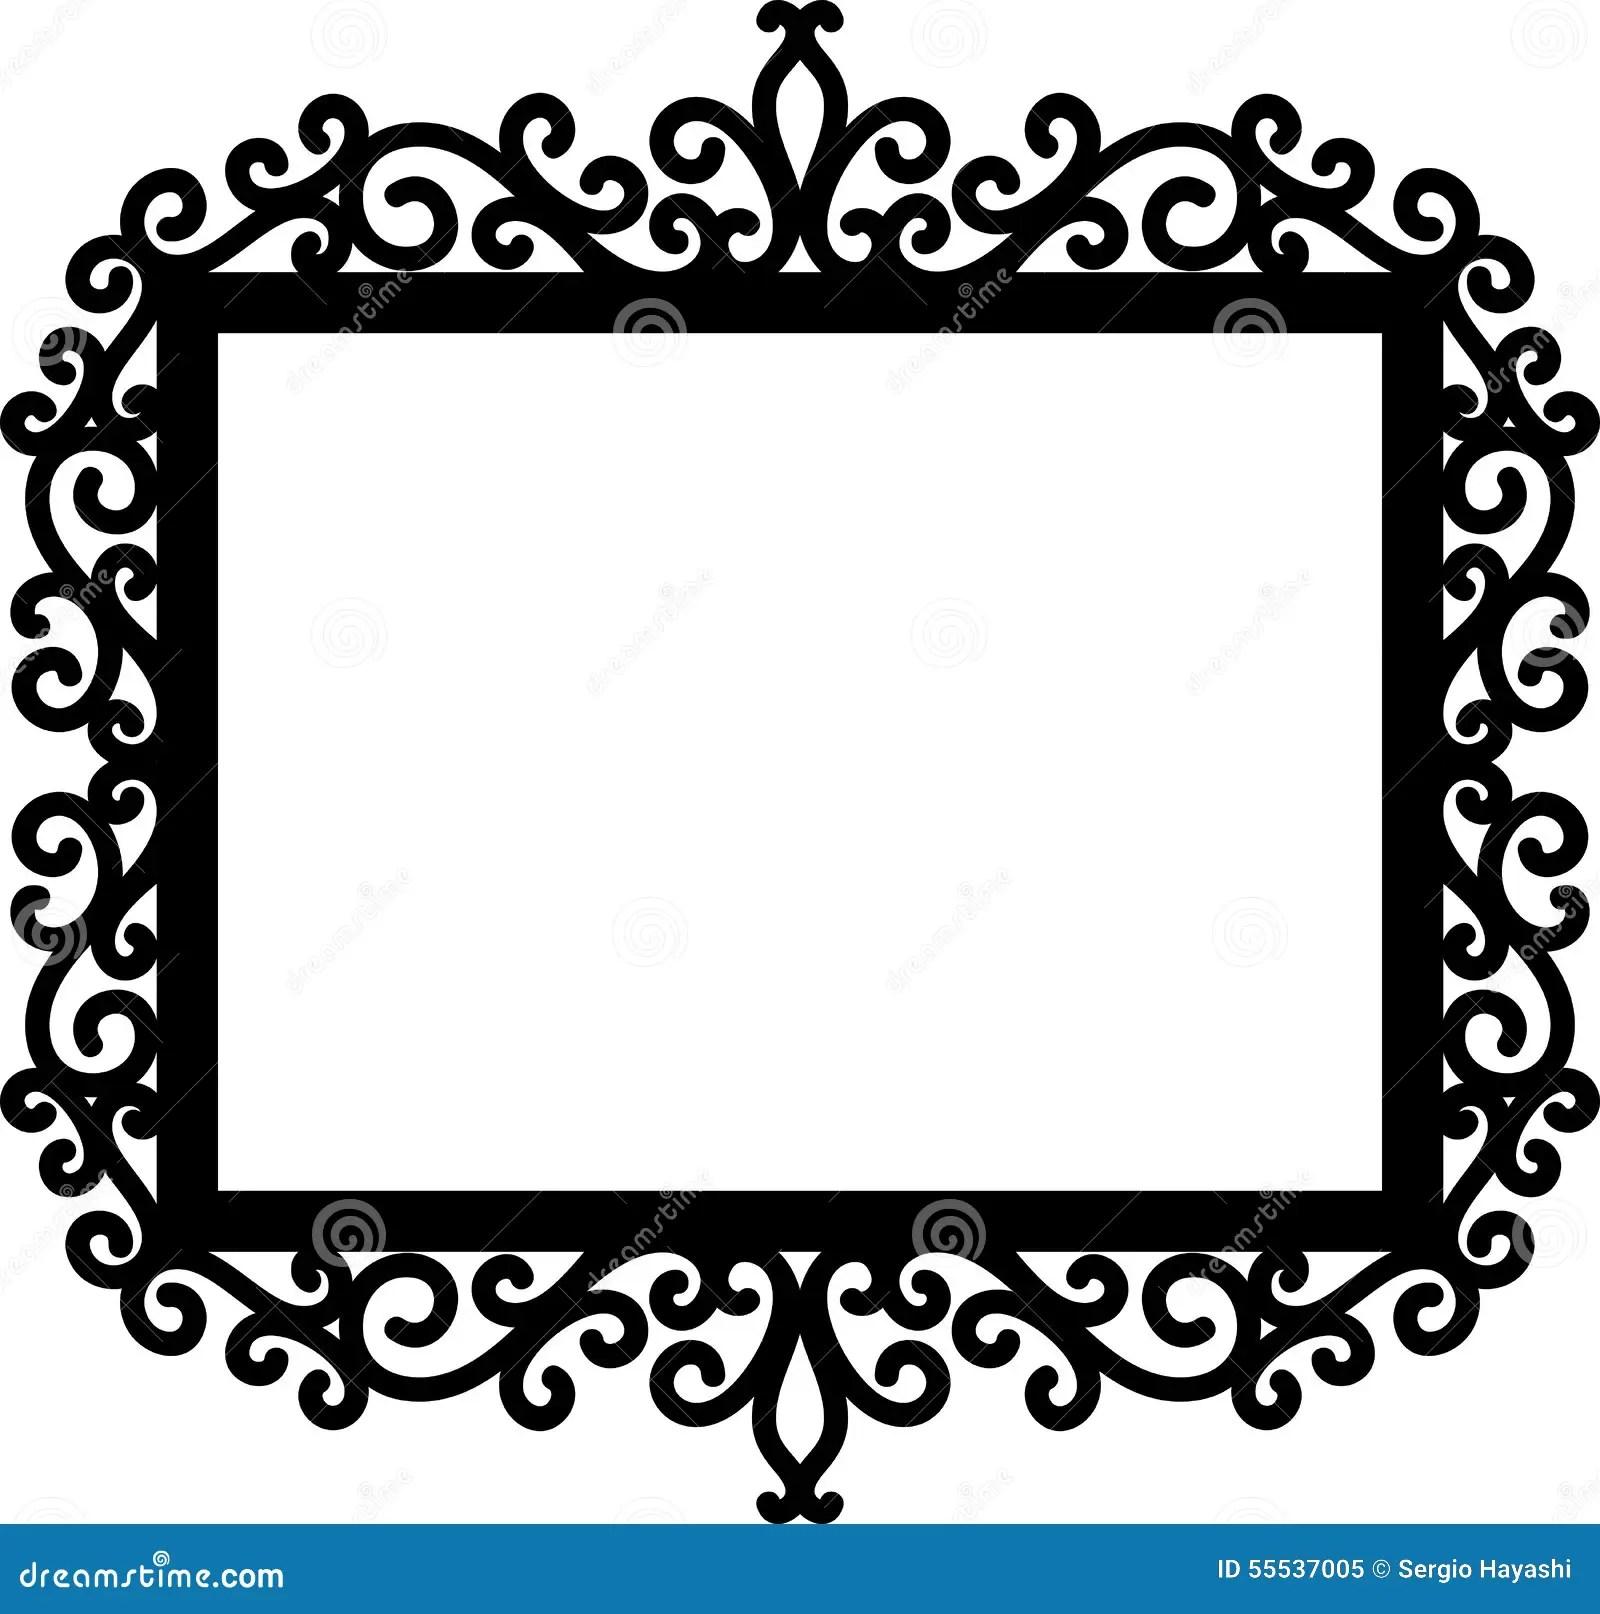 Decorative Frame Silhouette Stock Vector